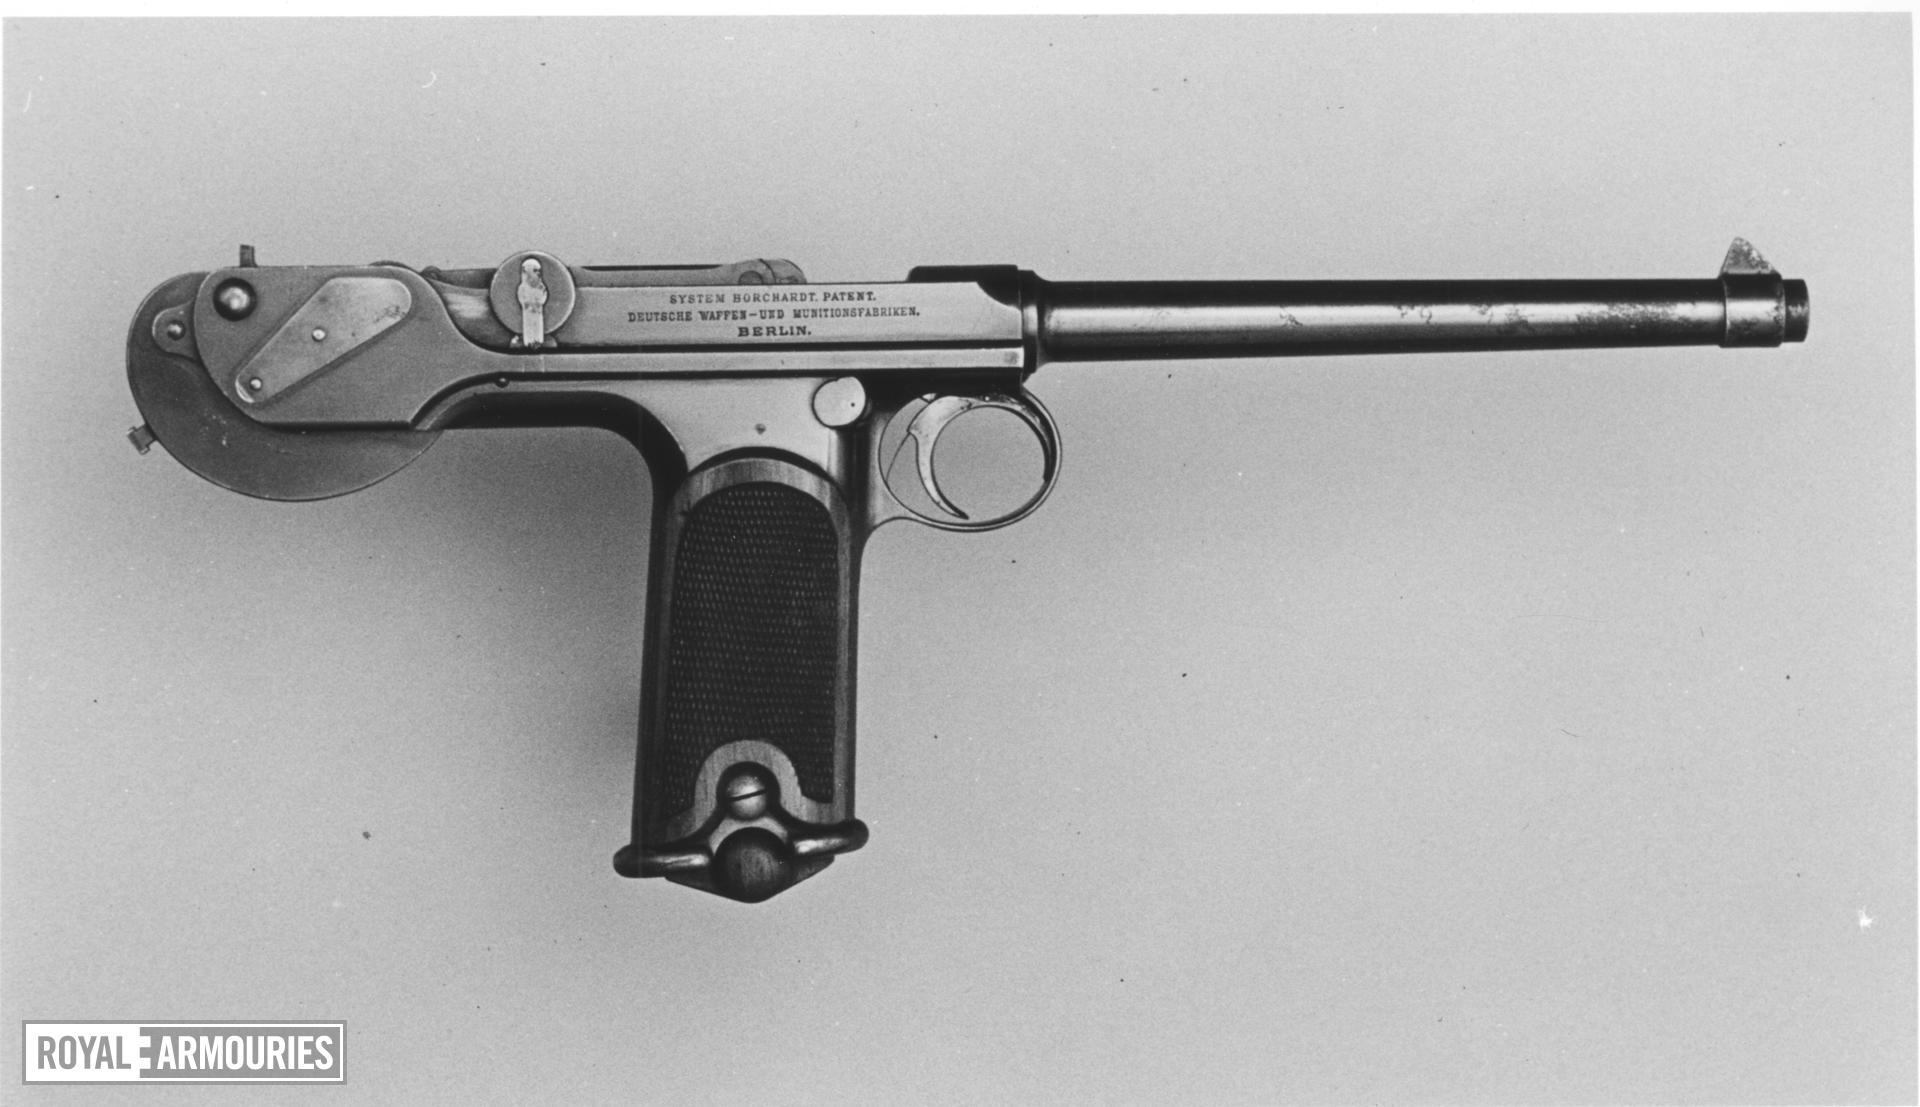 Centrefire self-loading pistol - Borchardt